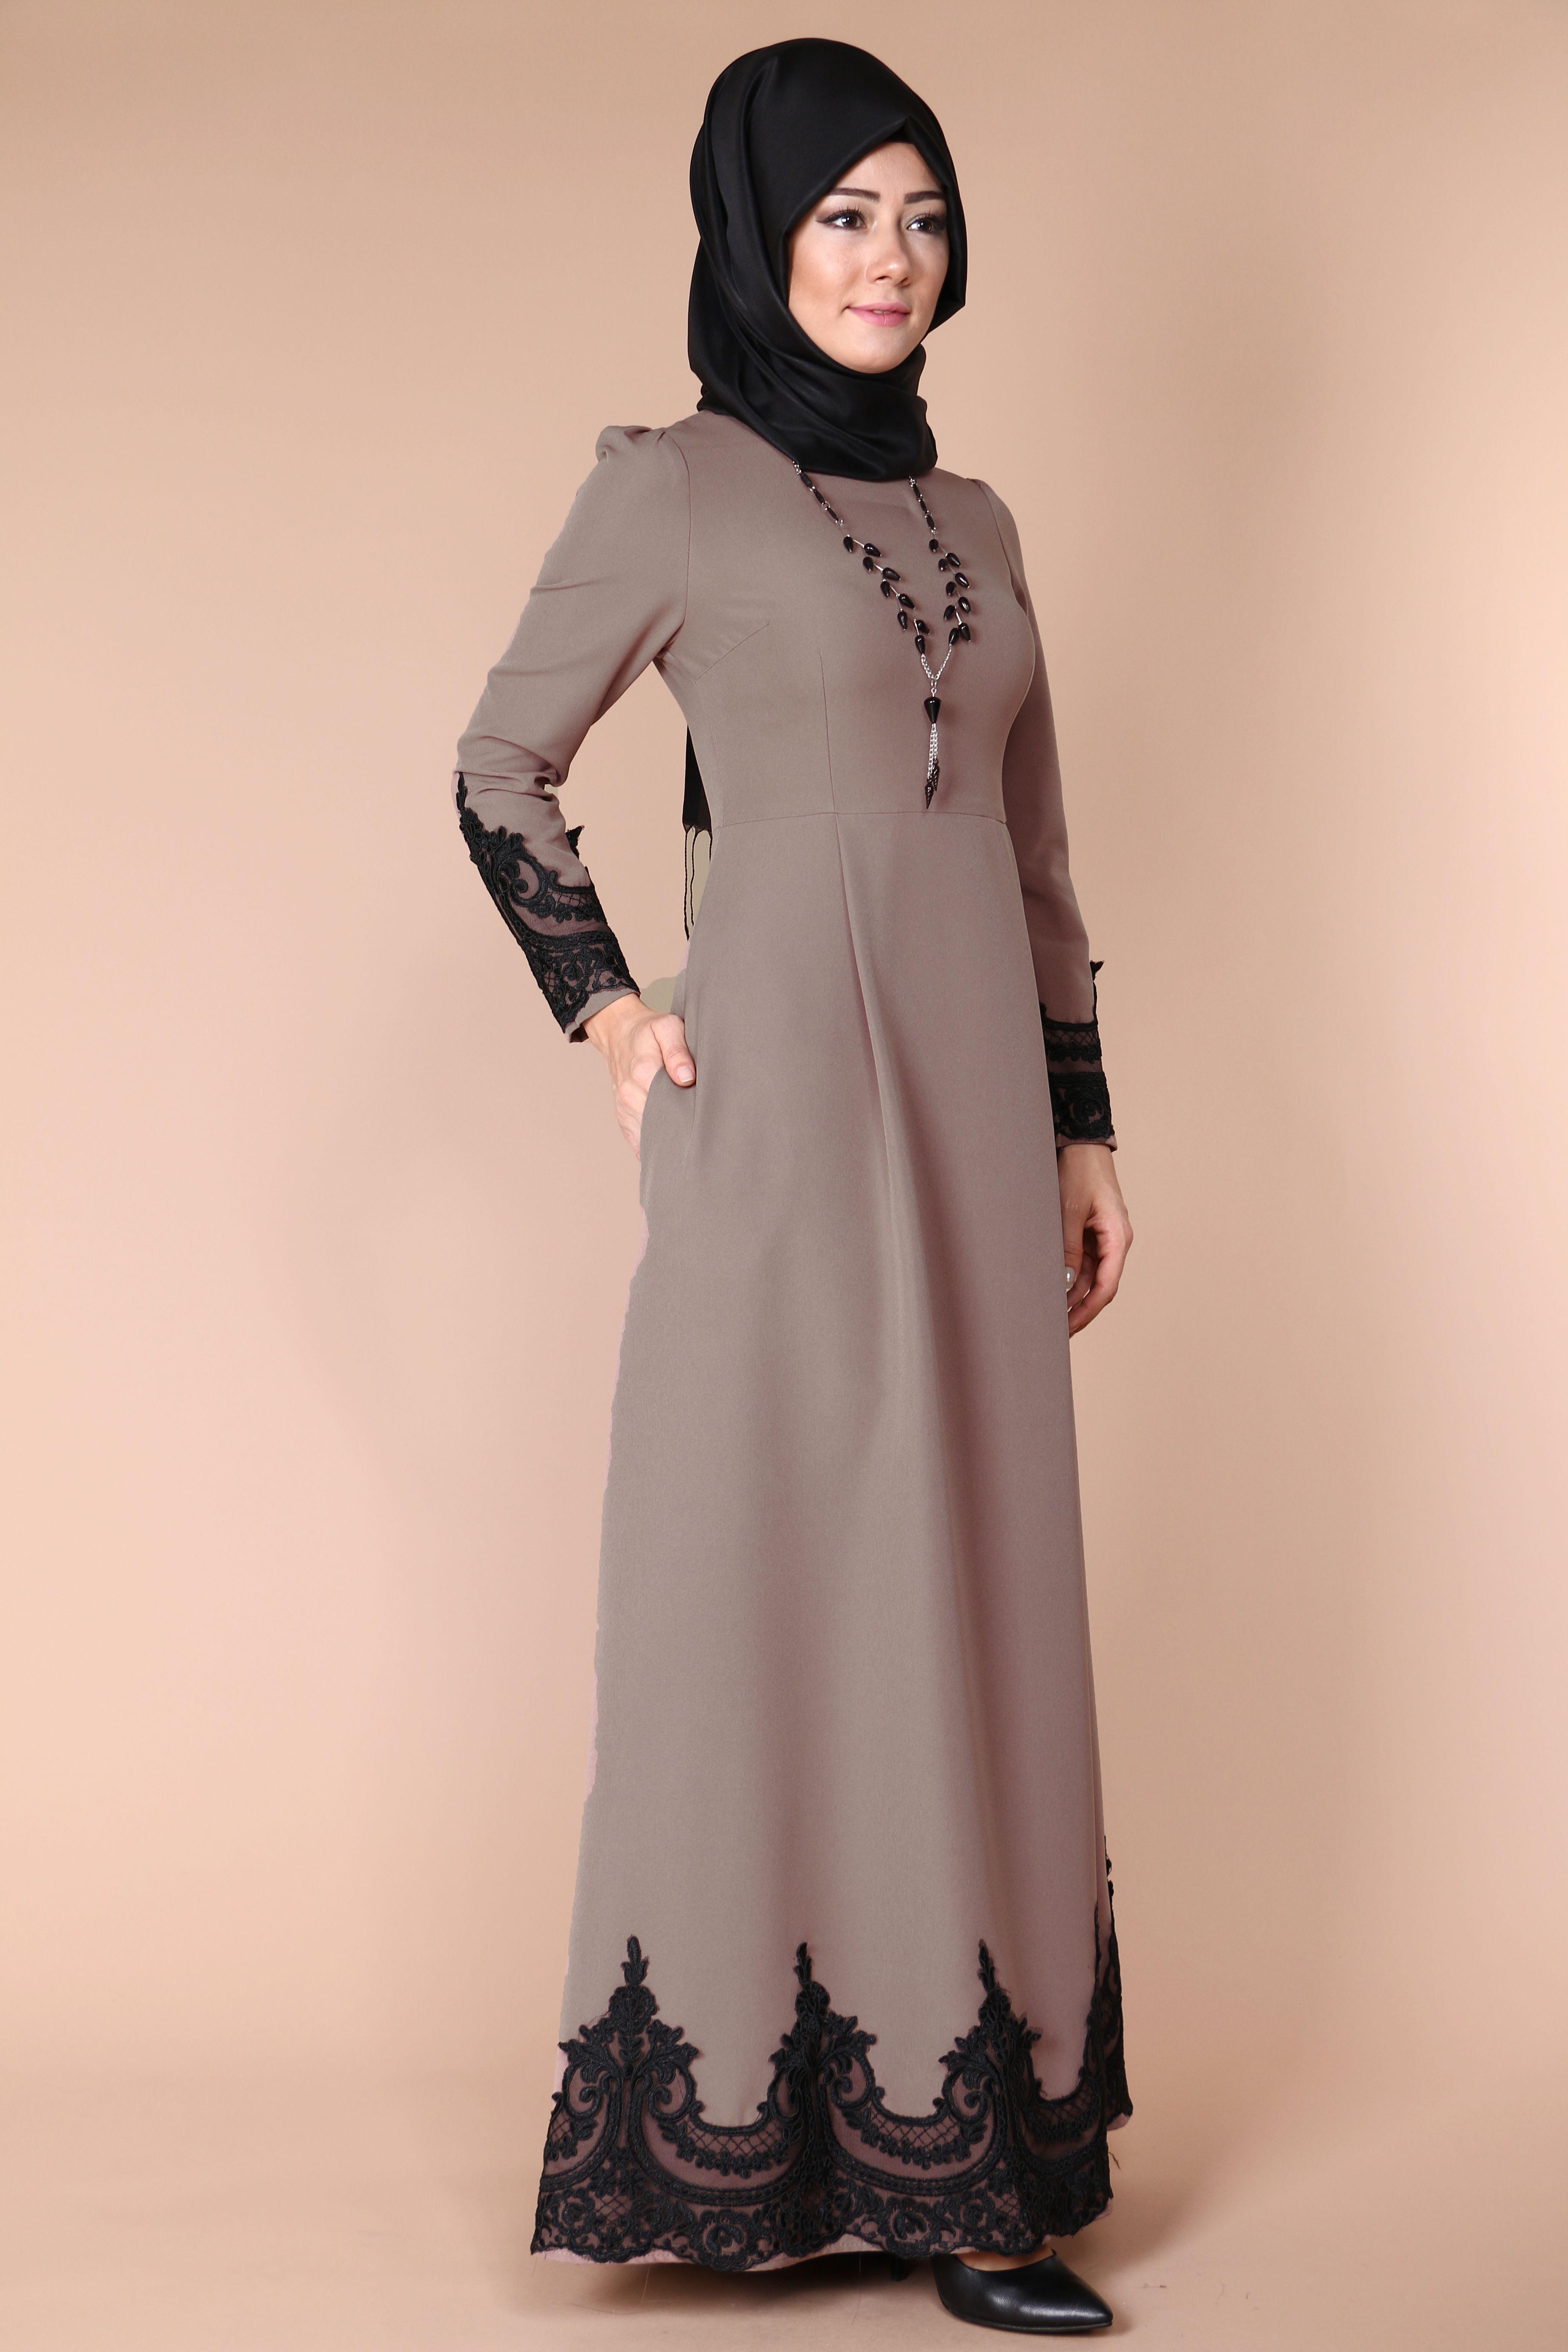 3f63d2951efef Minel Dantel Detay Elbise 139.90 TL Siparis 👉👉👉www.modaselvim.com Ürün